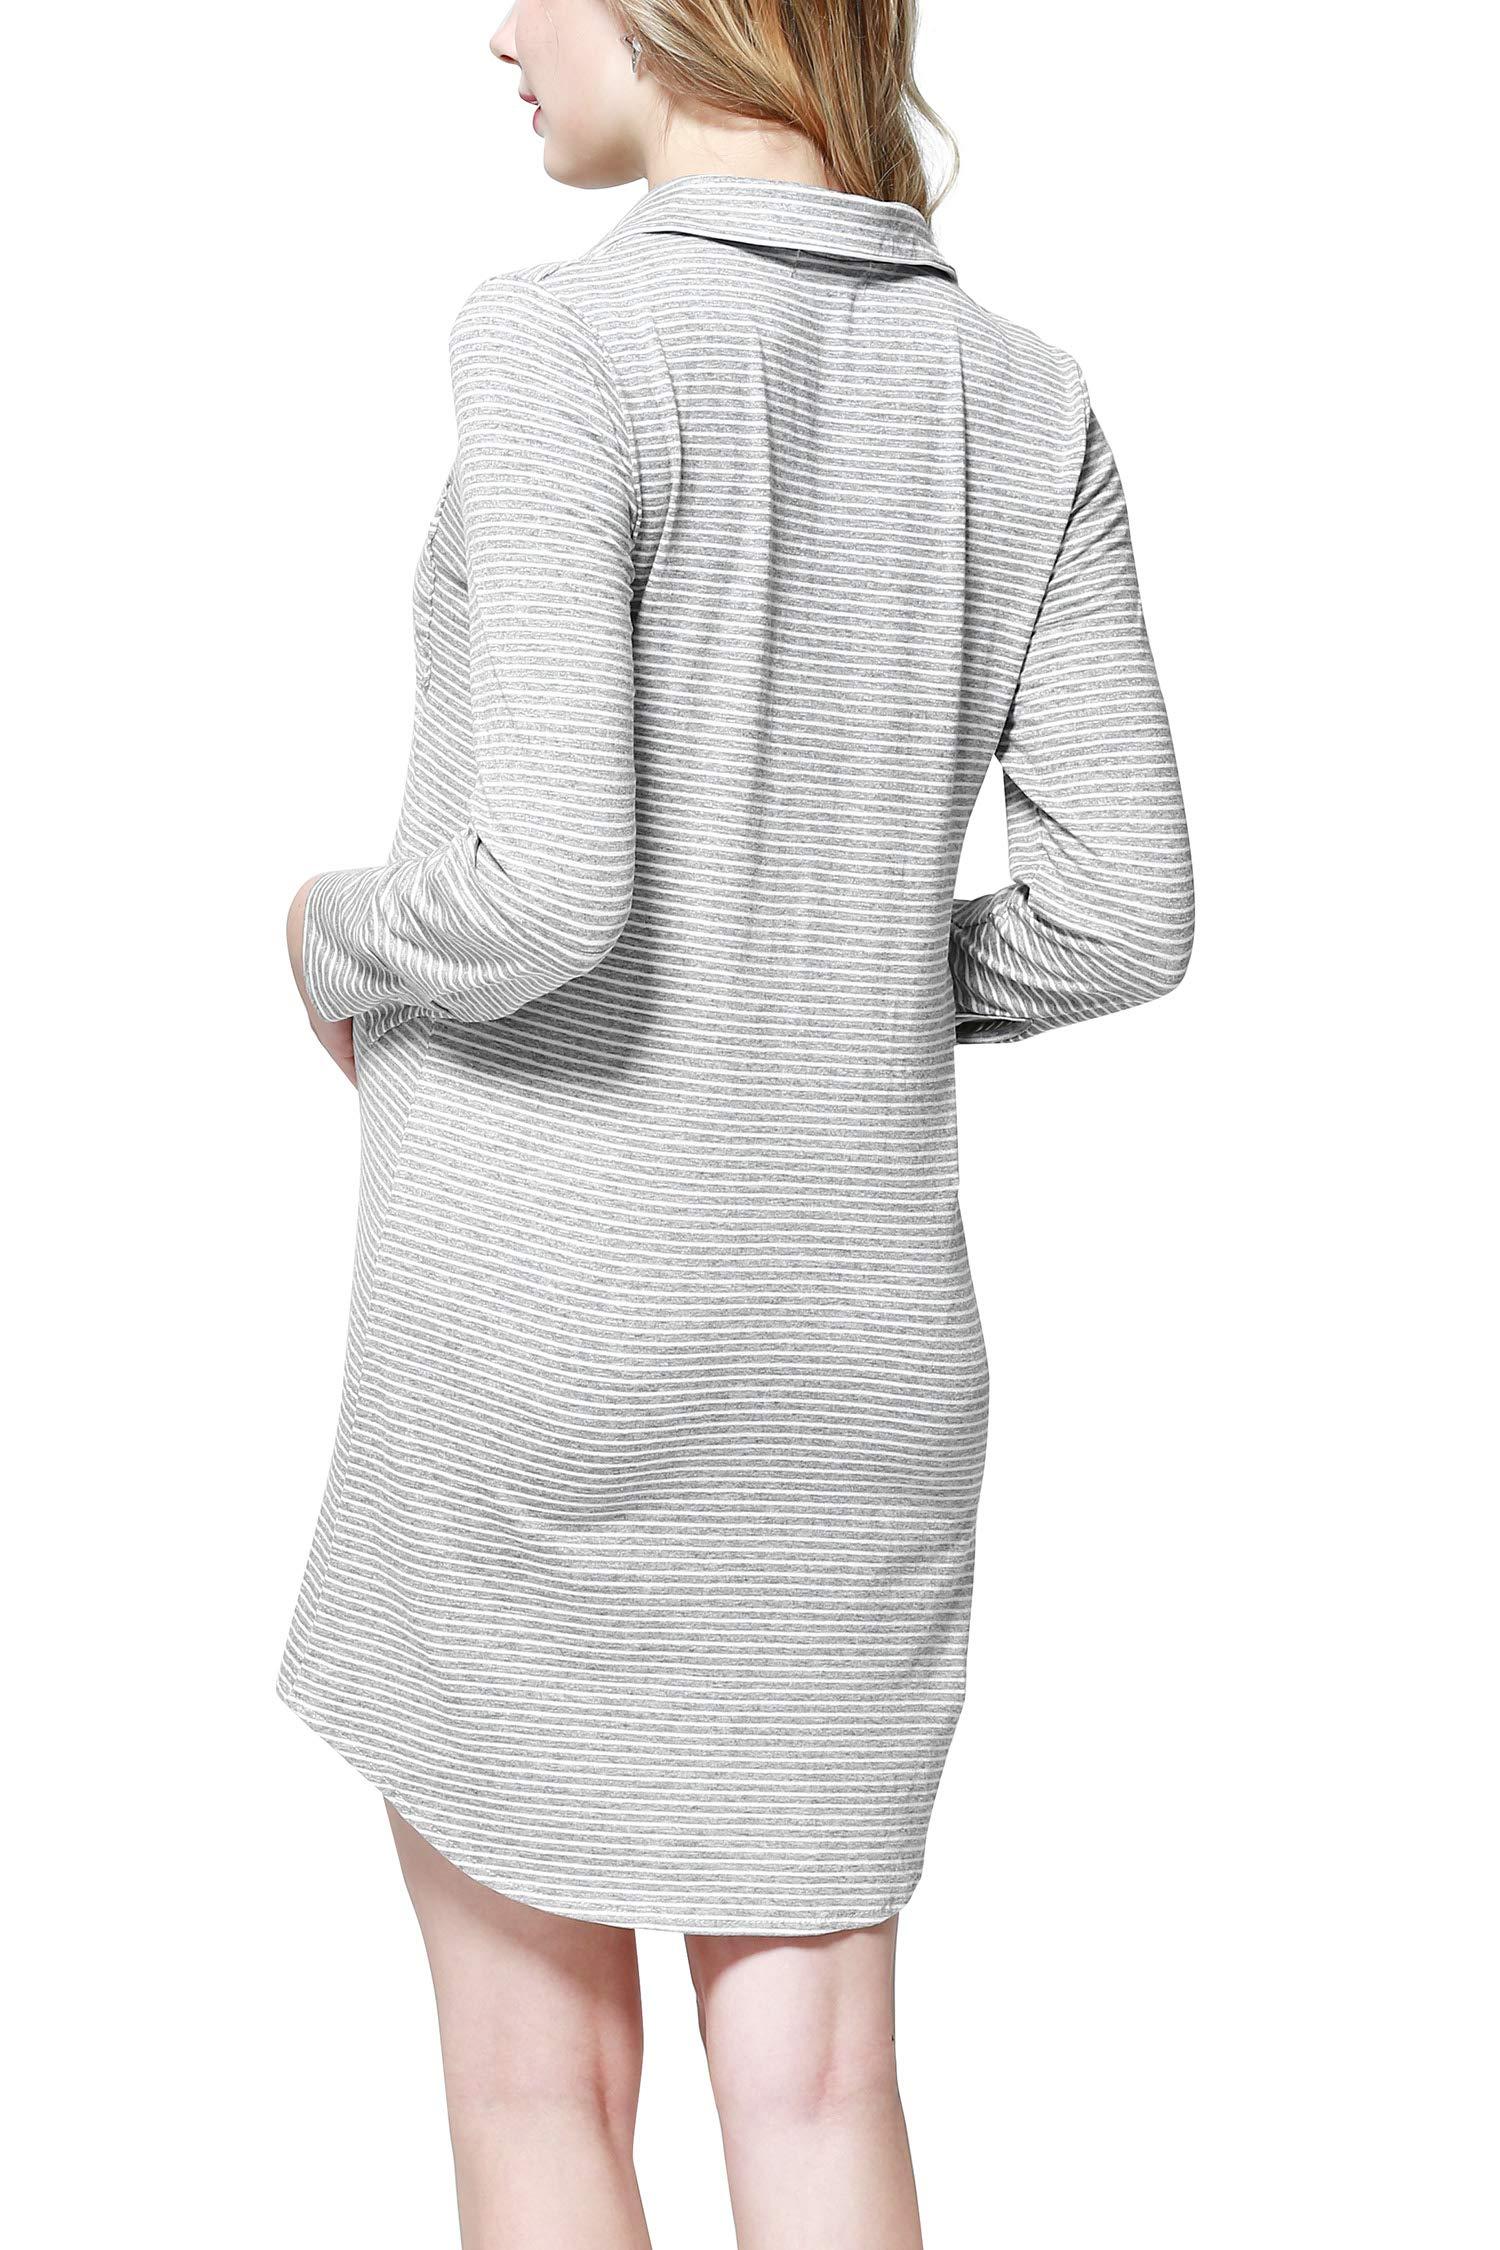 Dance Fairy Molliya Women's Maternity Dress Stripes Nursing Nightgown Breastfeeding,Lapel Collar Pajamas (Gray, M) by Dance Fairy (Image #3)